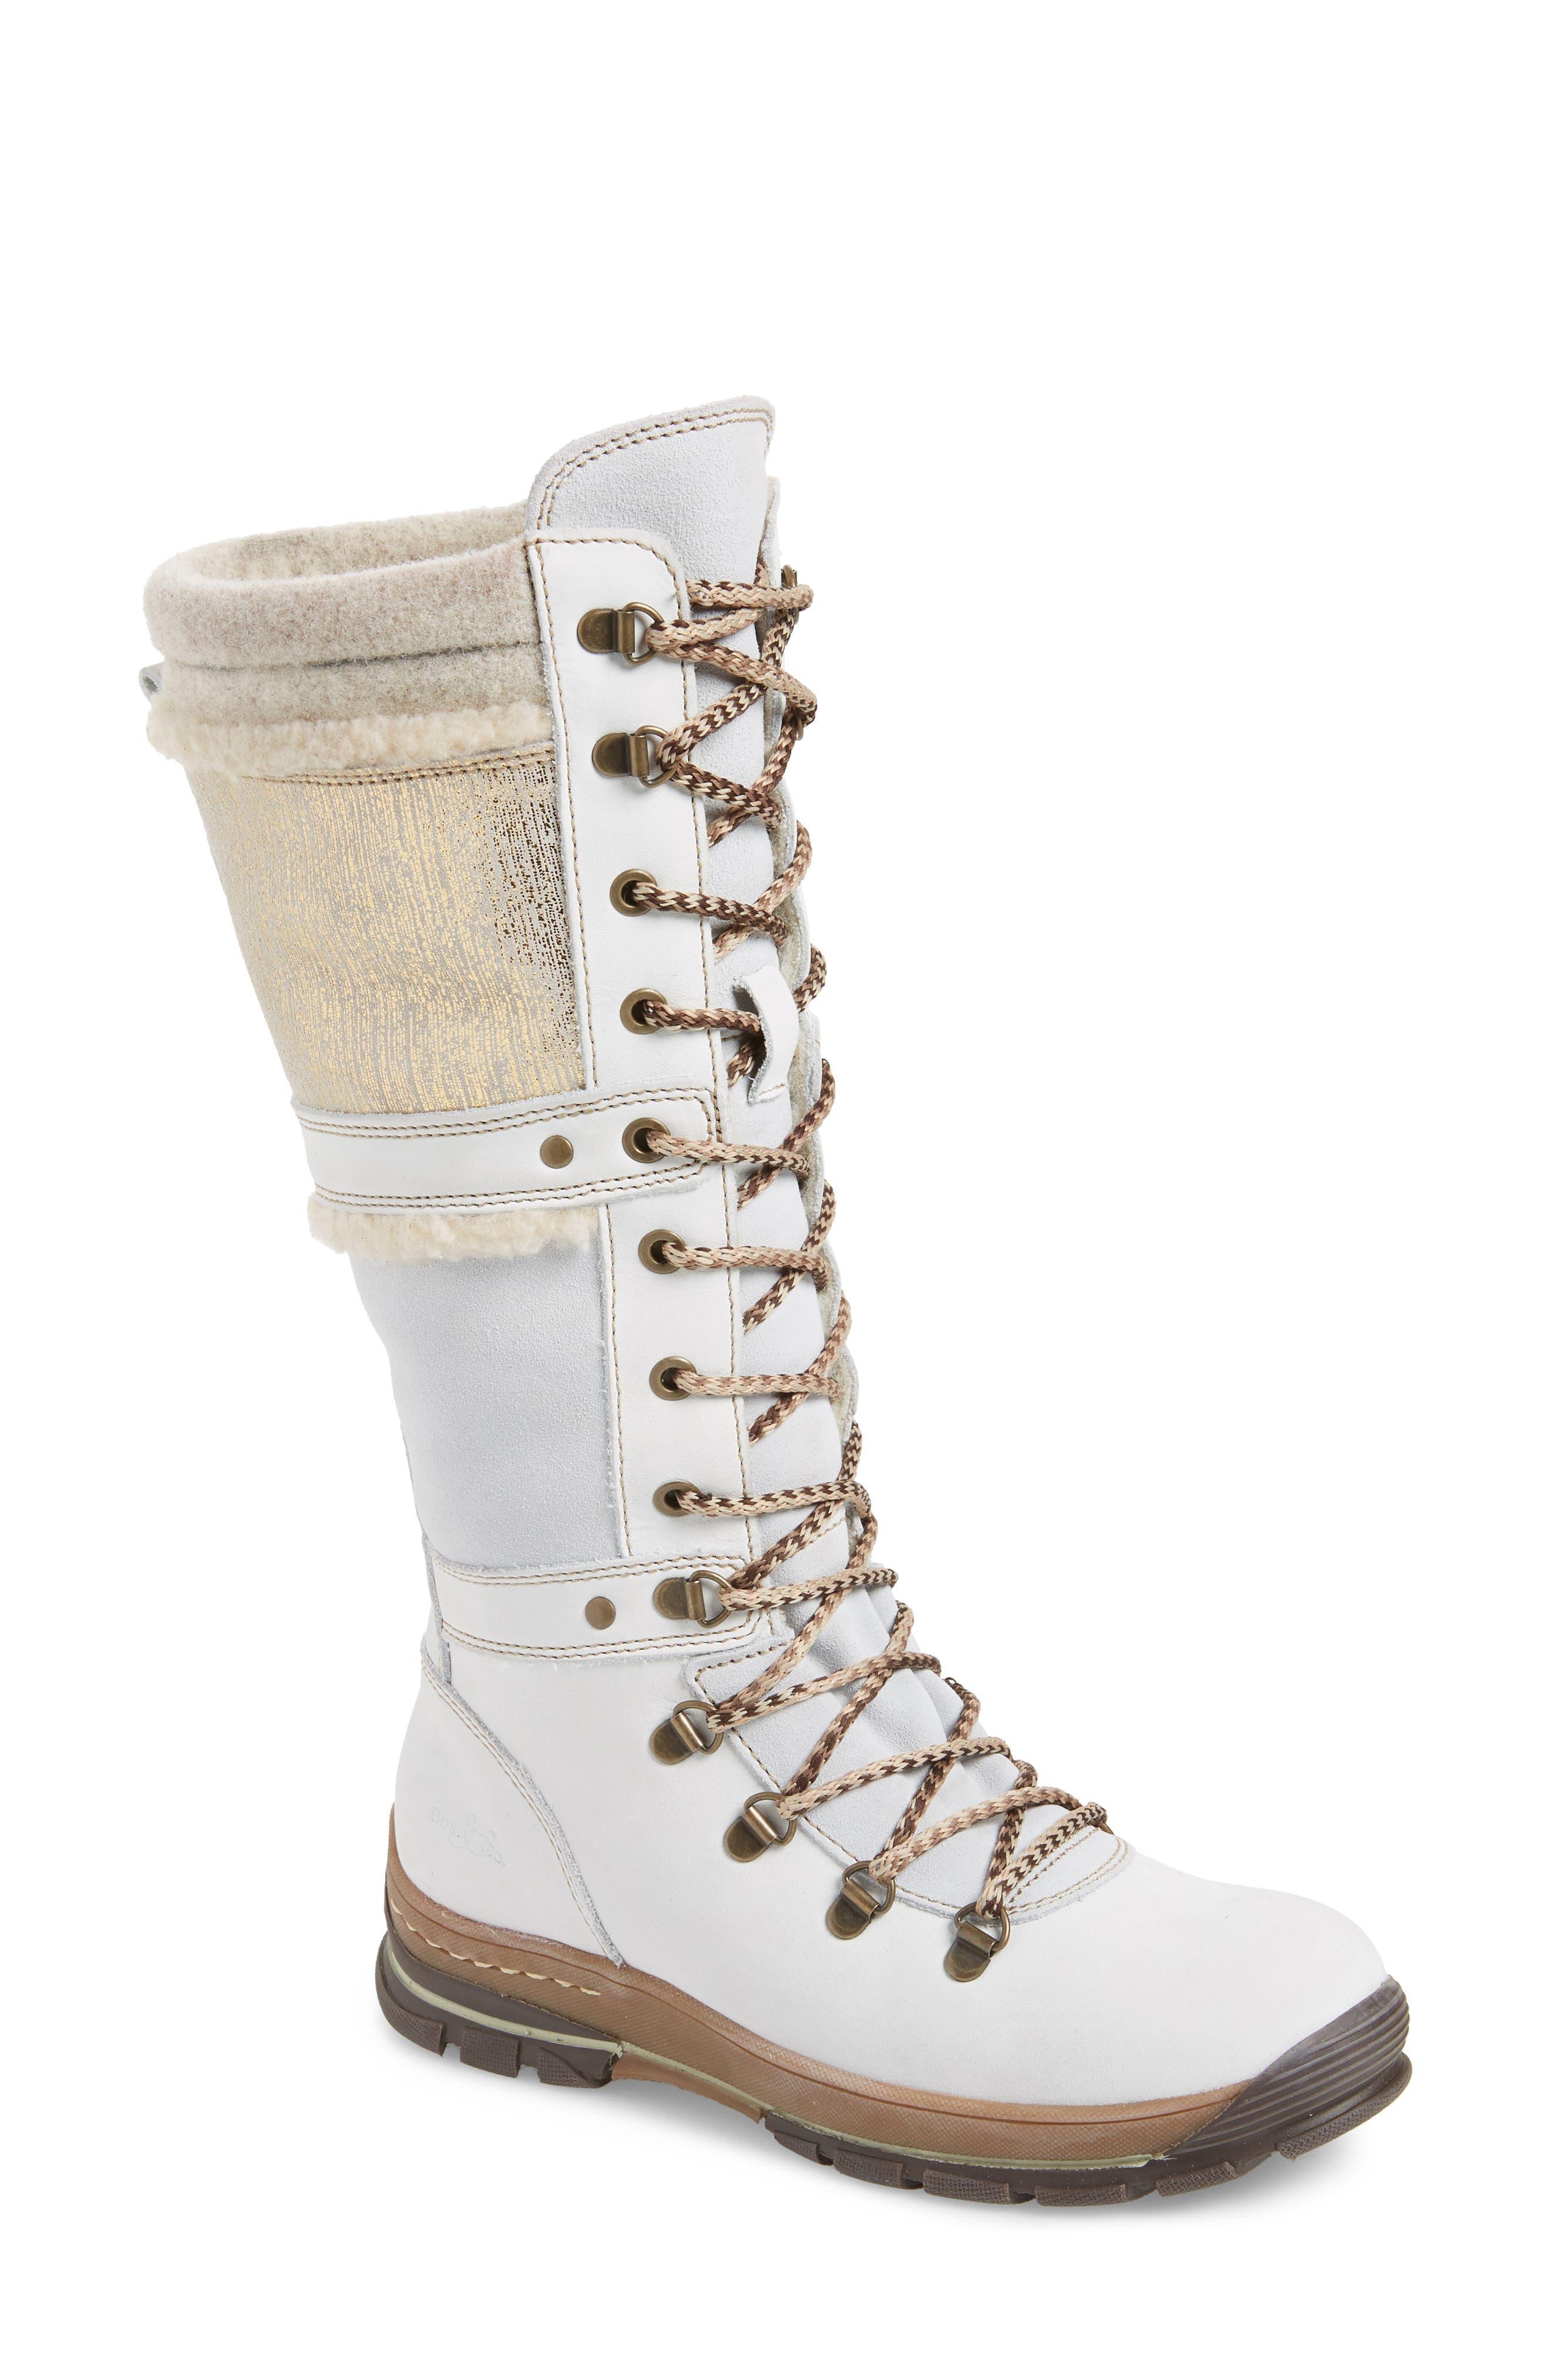 Bos. & Co. Gabriella Waterproof Boot, White